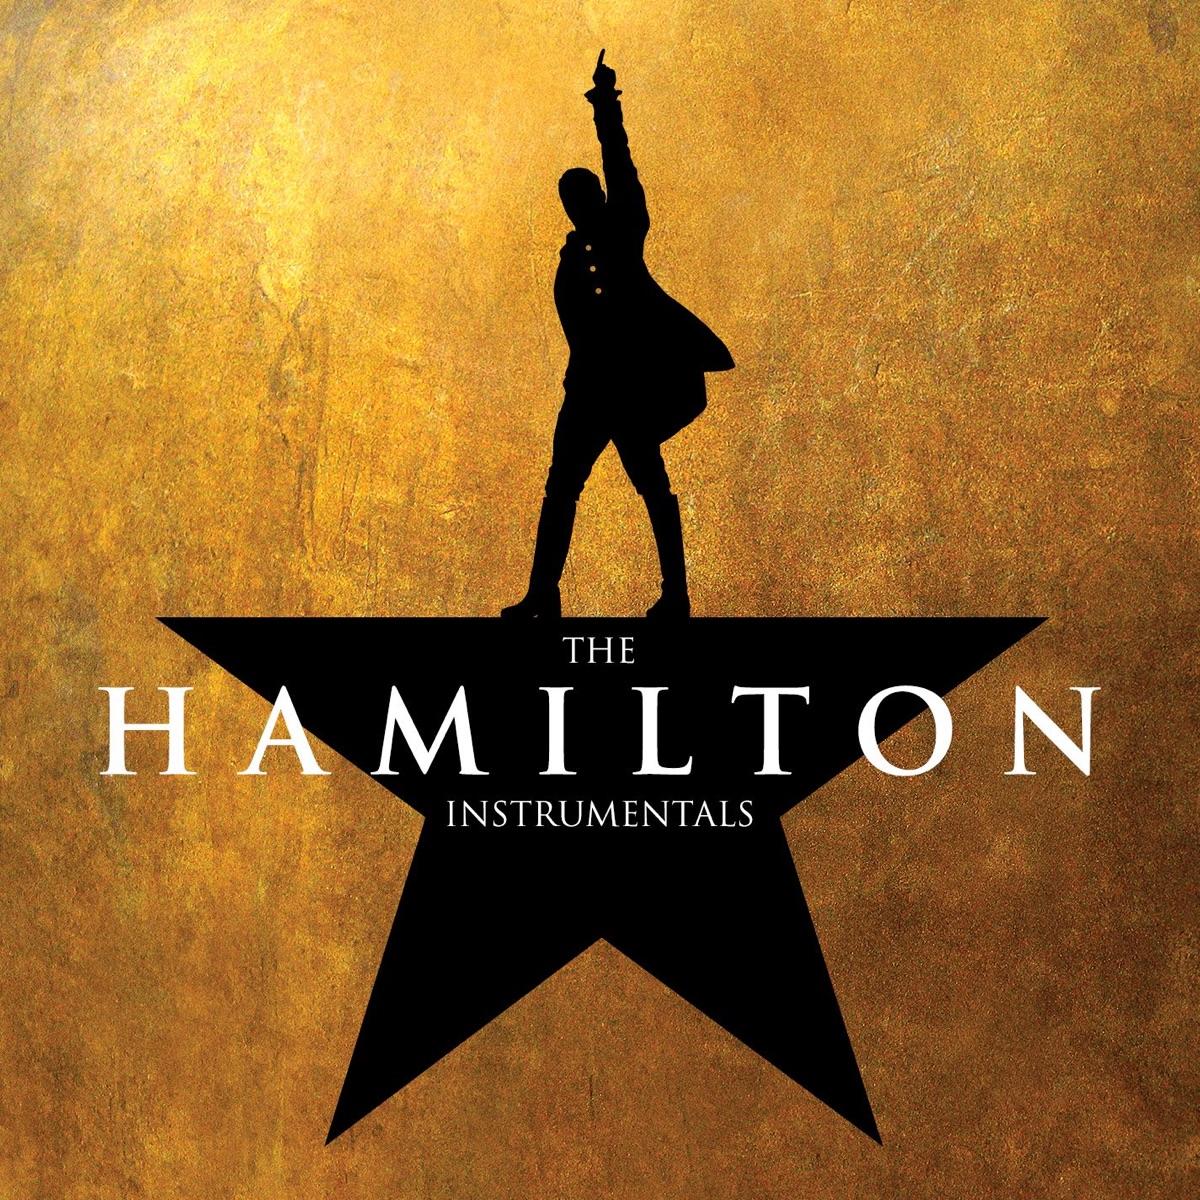 The Hamilton Instrumentals Original Broadway Cast of Hamilton CD cover